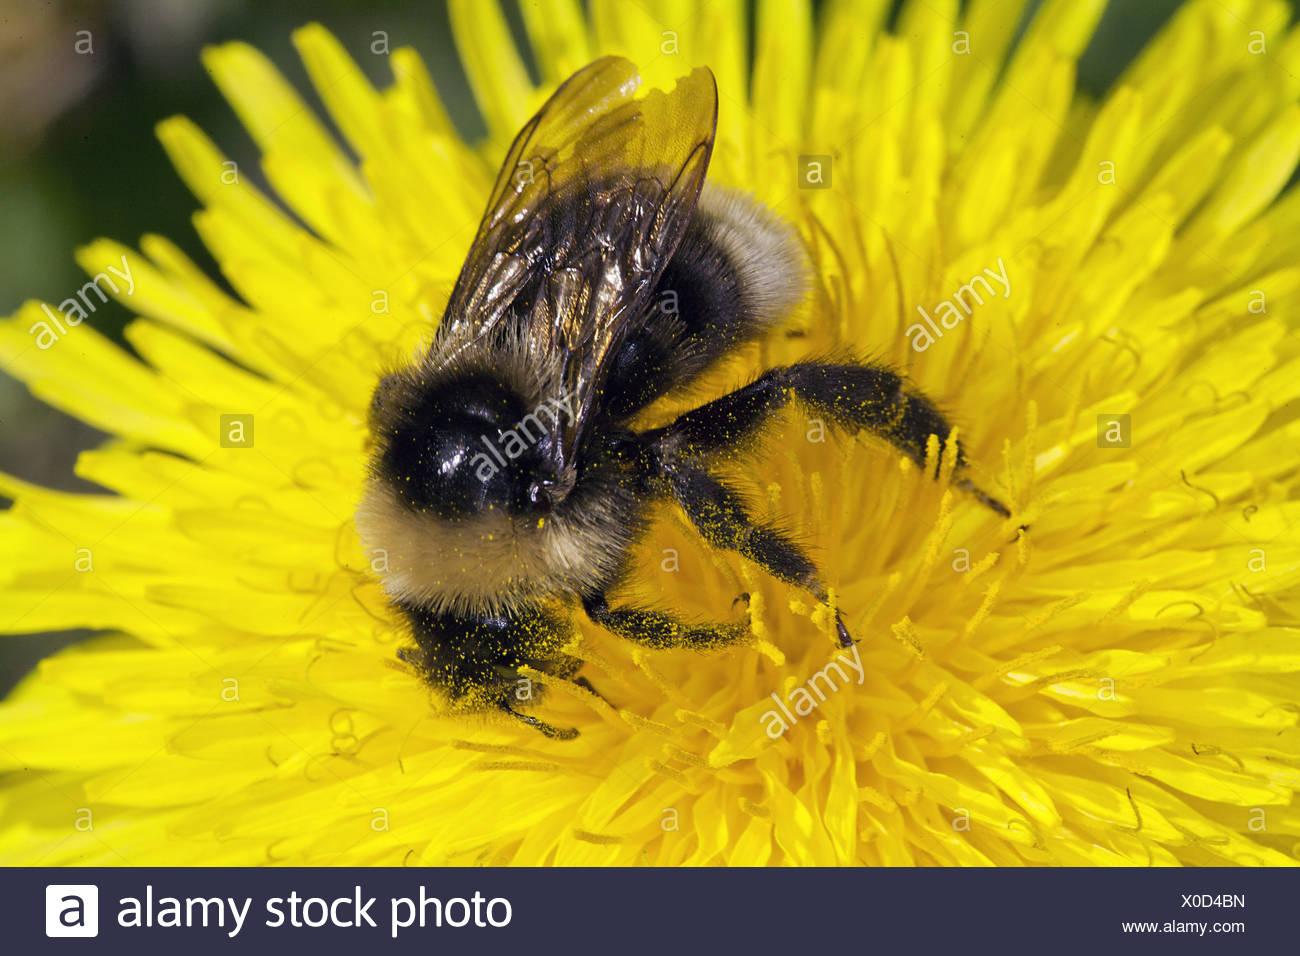 Bombus sylvestris, Cuckoo Bumblebee - Stock Image